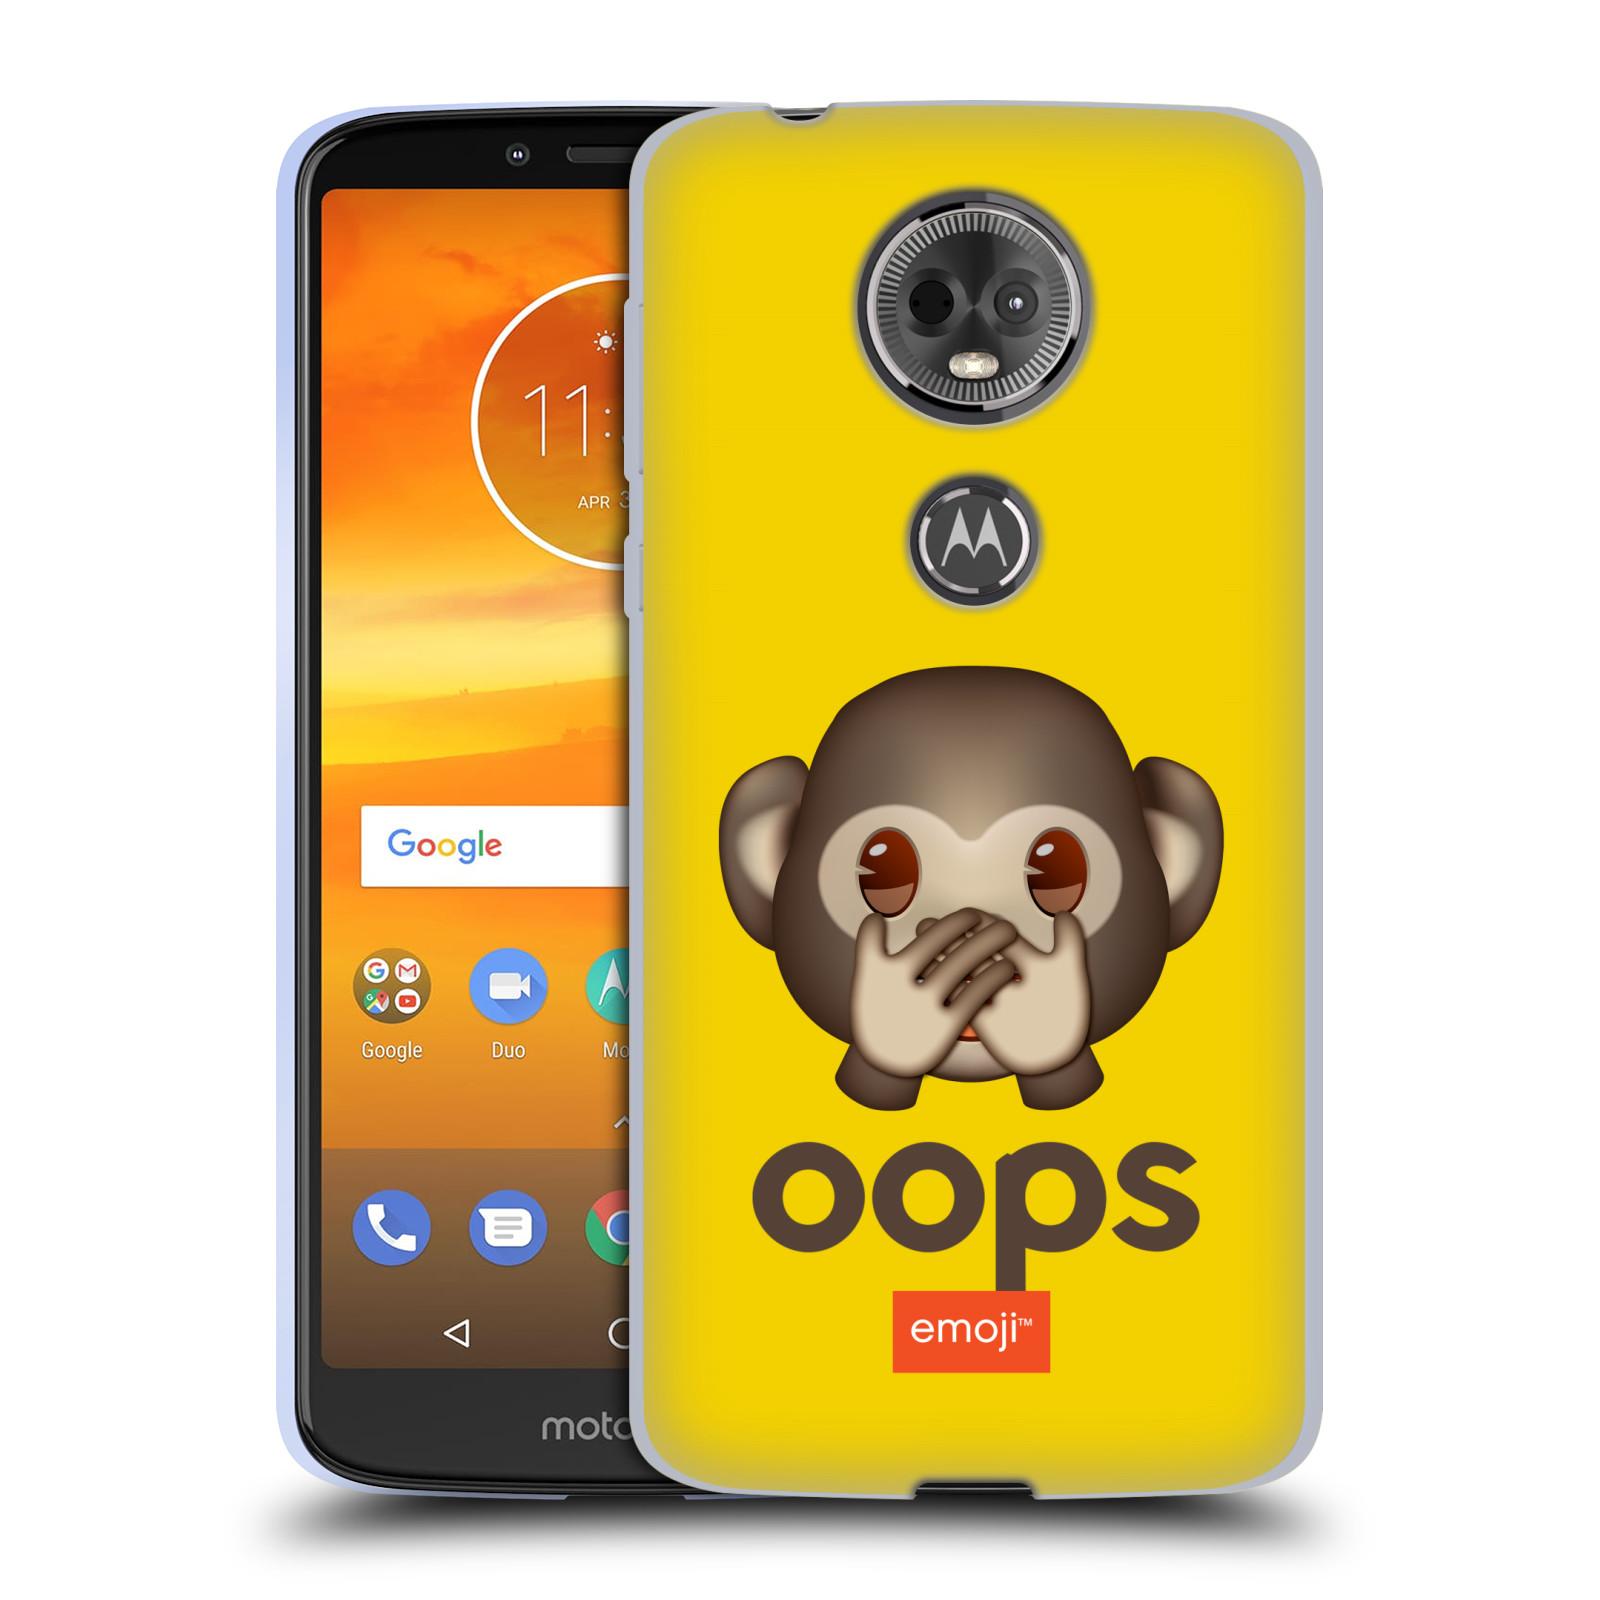 Silikonové pouzdro na mobil Motorola Moto E5 Plus - Head Case - EMOJI - Opička OOPS